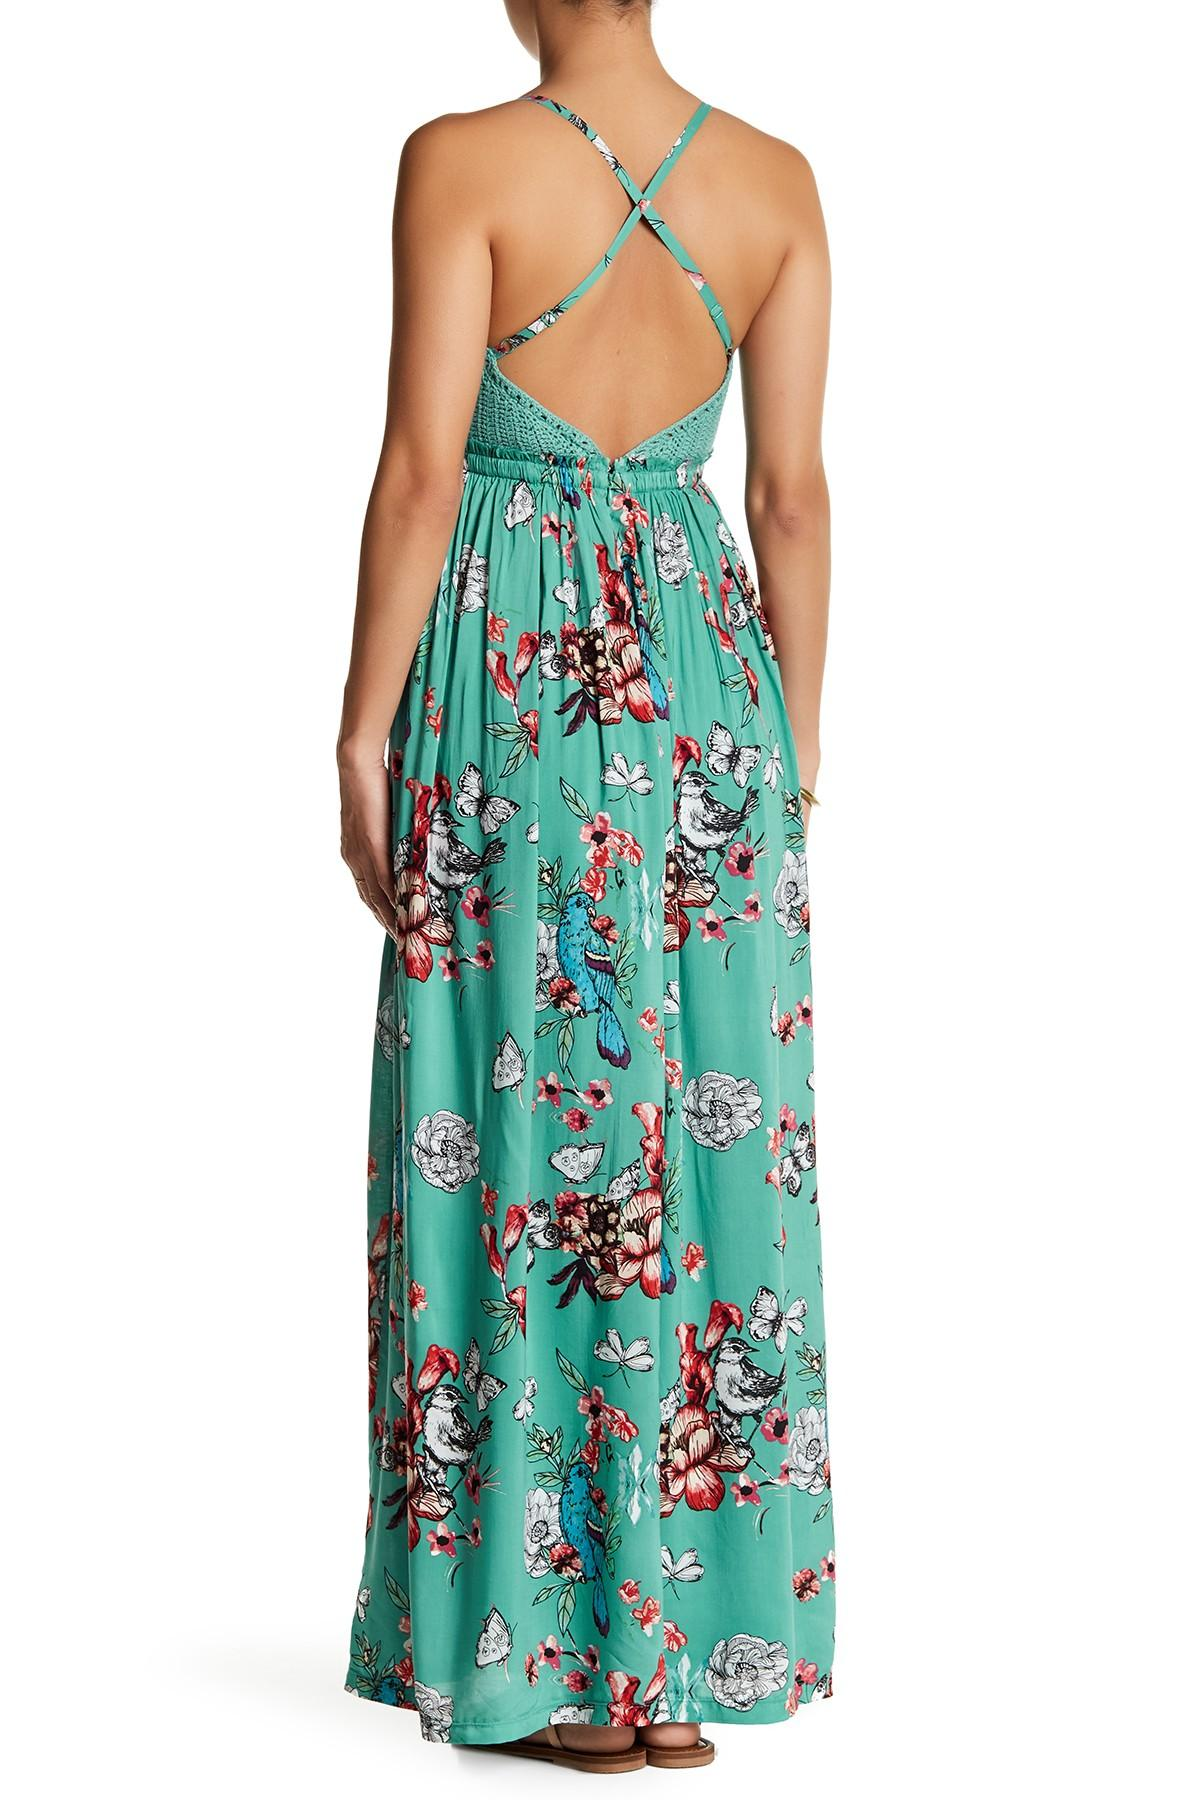 Lyst Jessica Simpson Paley Maxi Dress